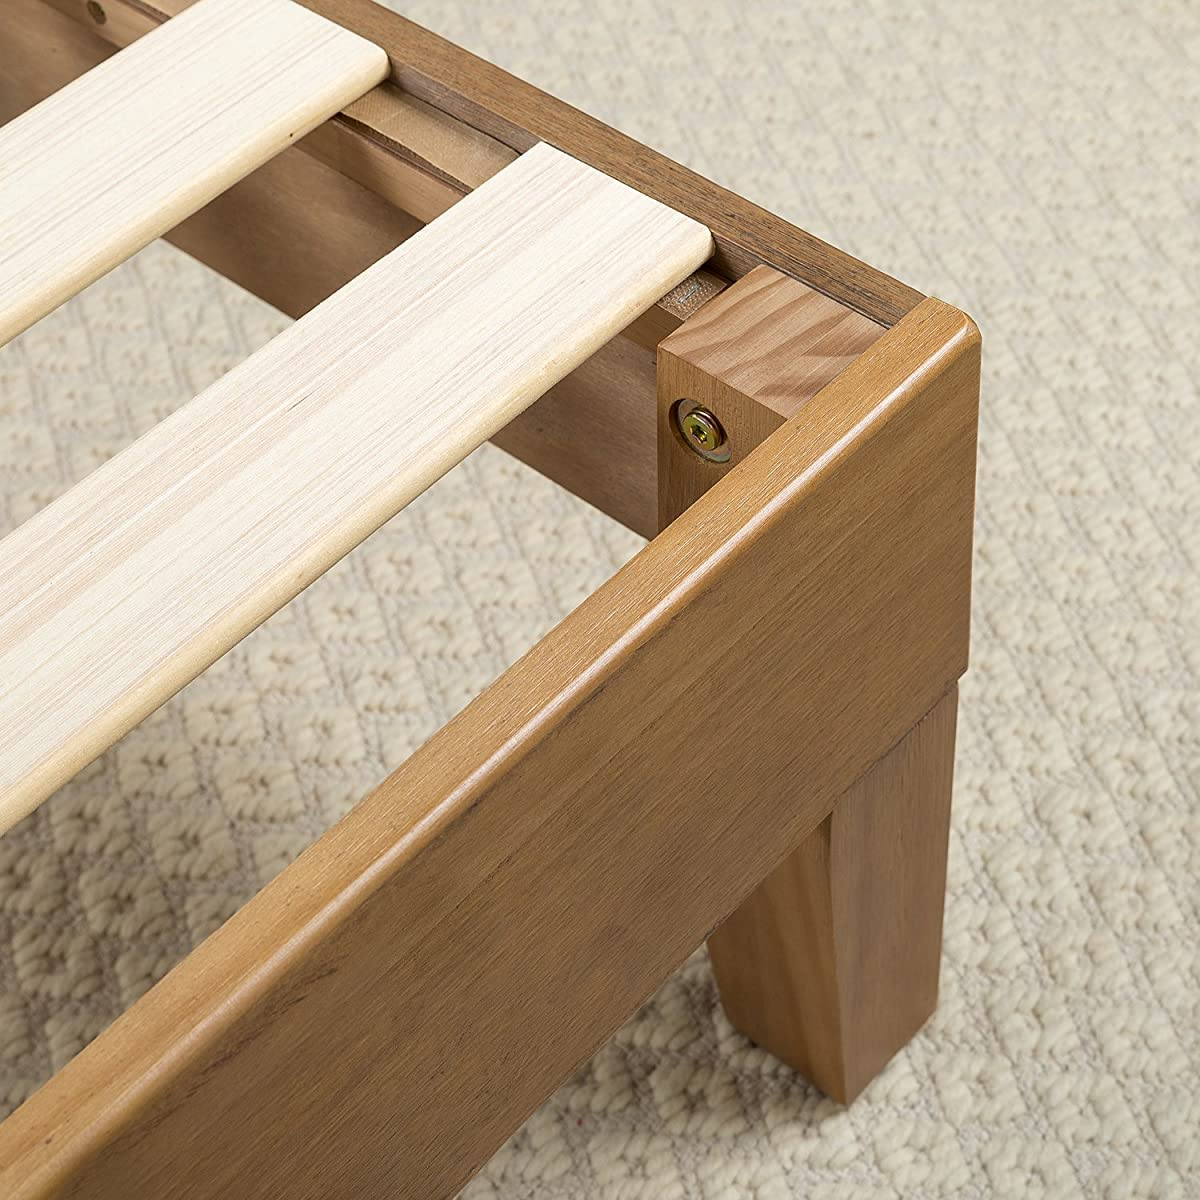 Zinus 12 Inch Deluxe Wood Platform Bed/No Boxspring Needed/Wood Slat Support/Rustic Pine Finish, Queen